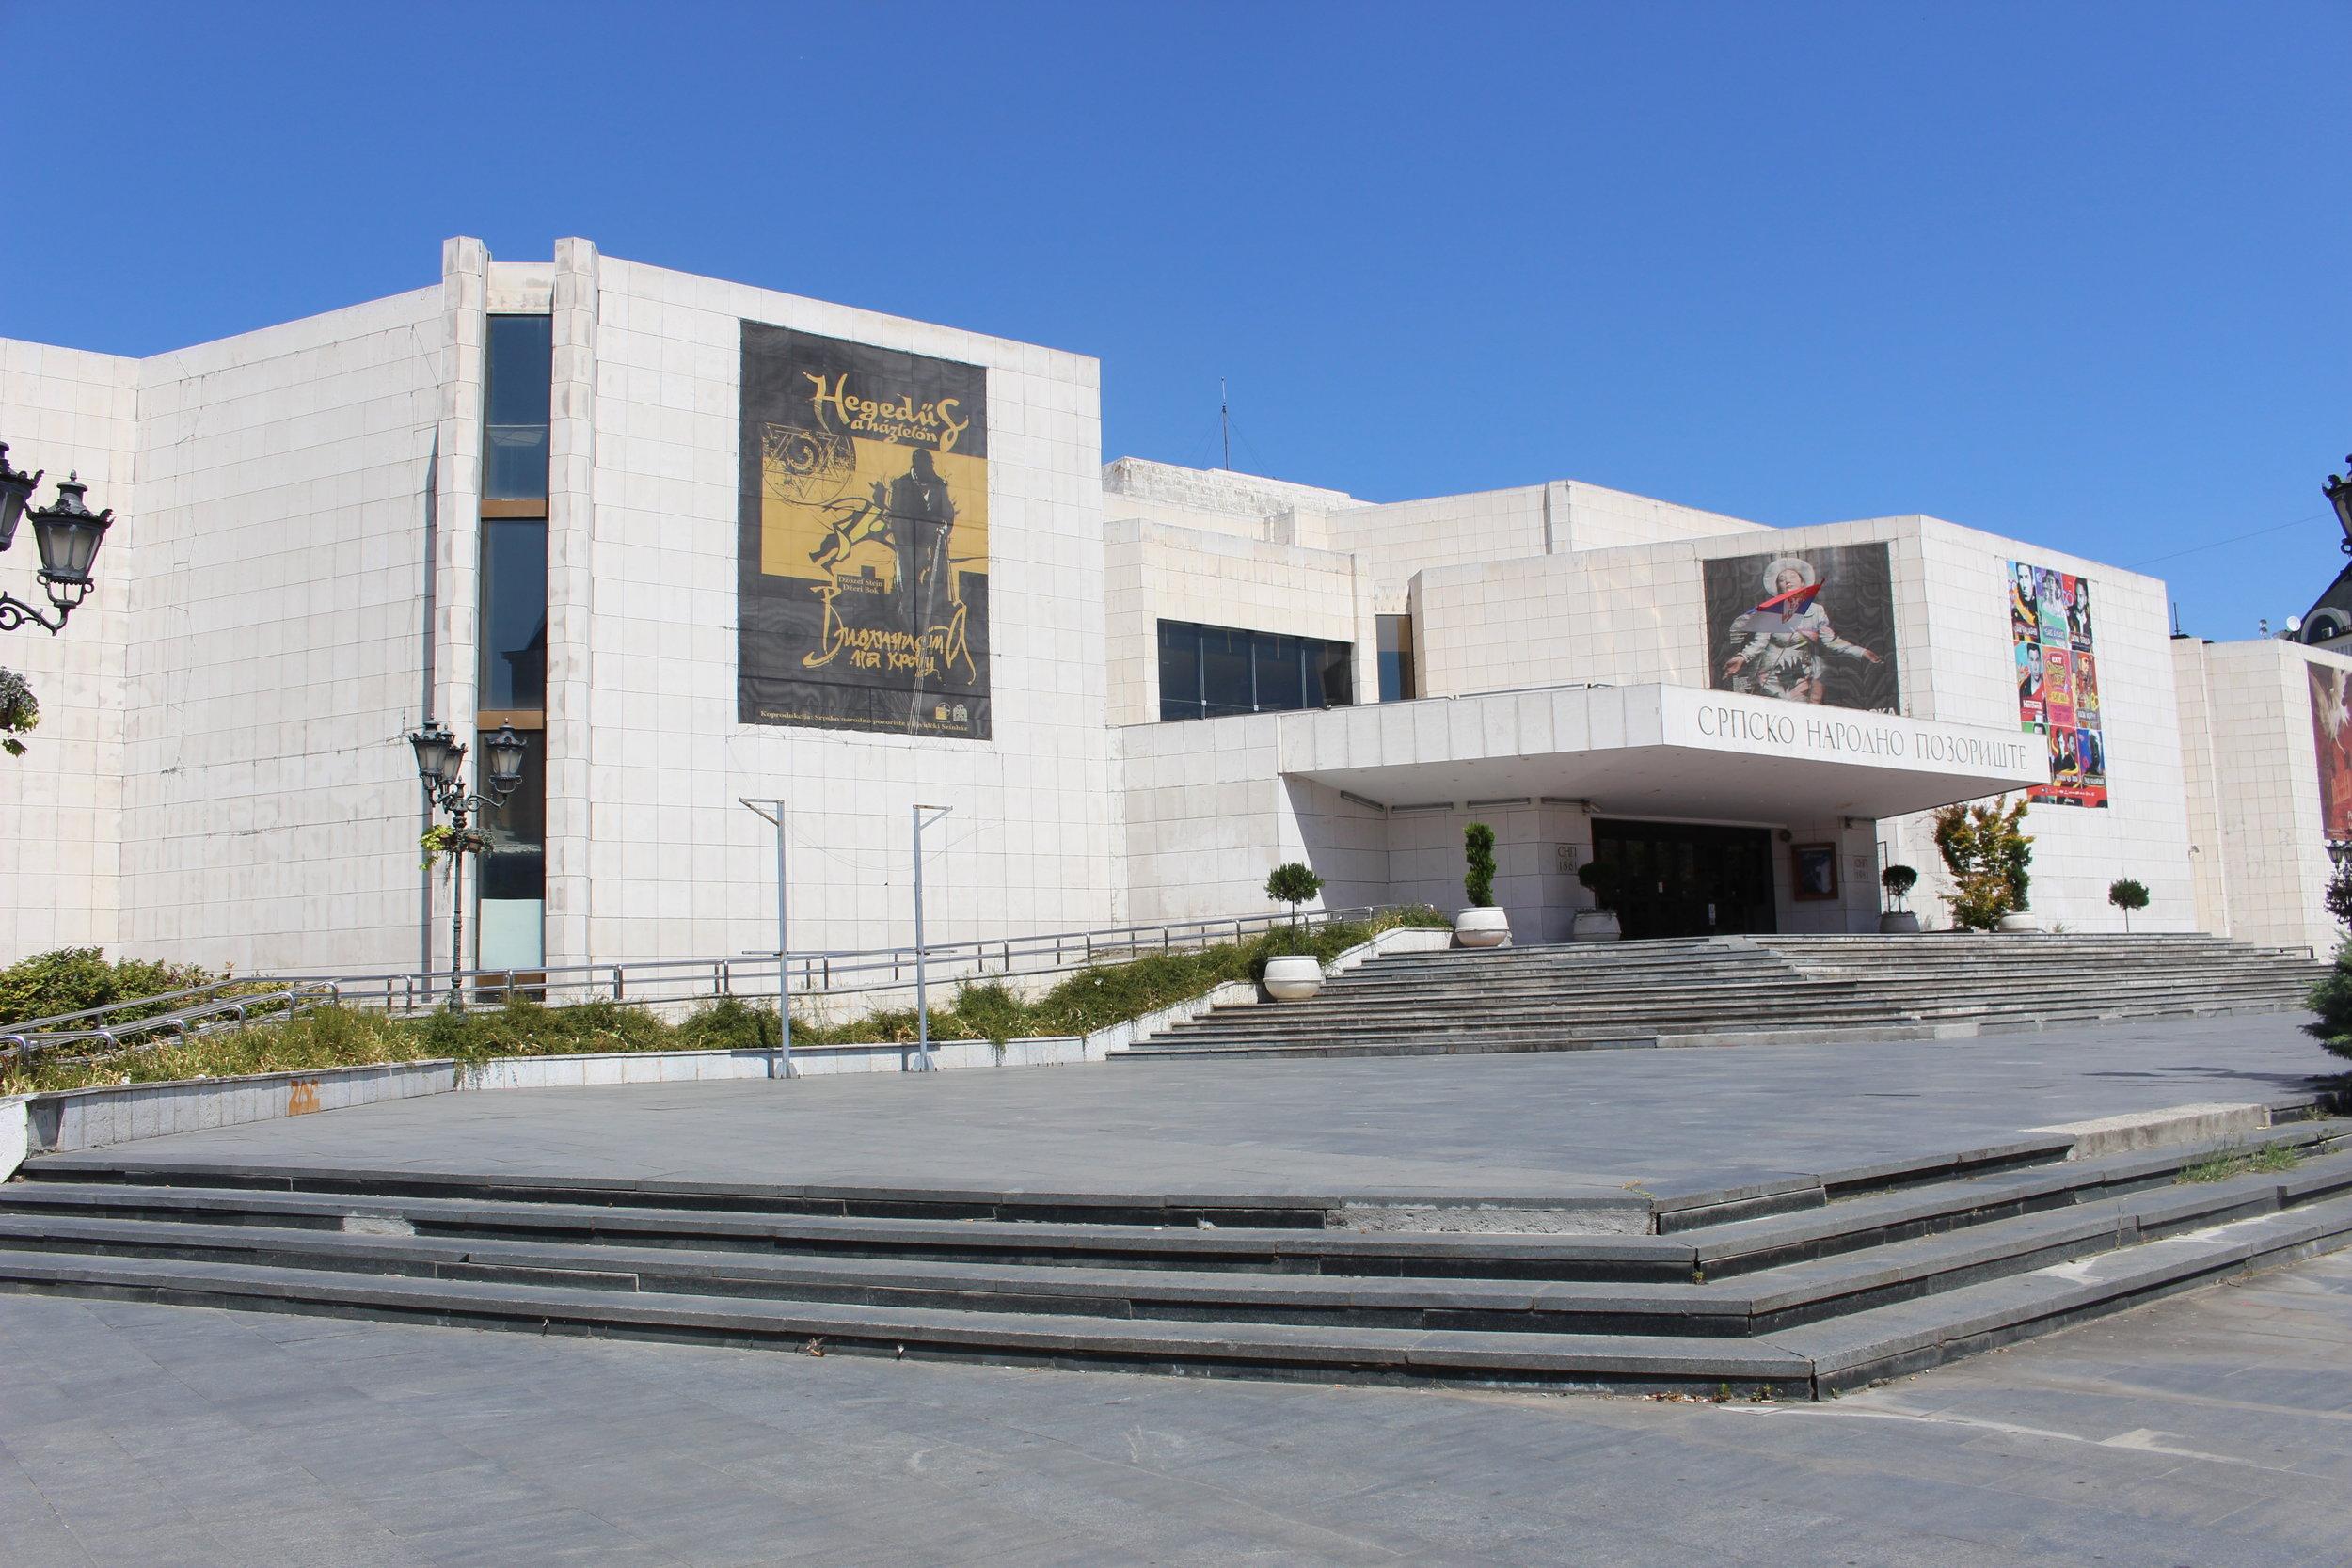 Serbian National Theatre (Novi Sad)